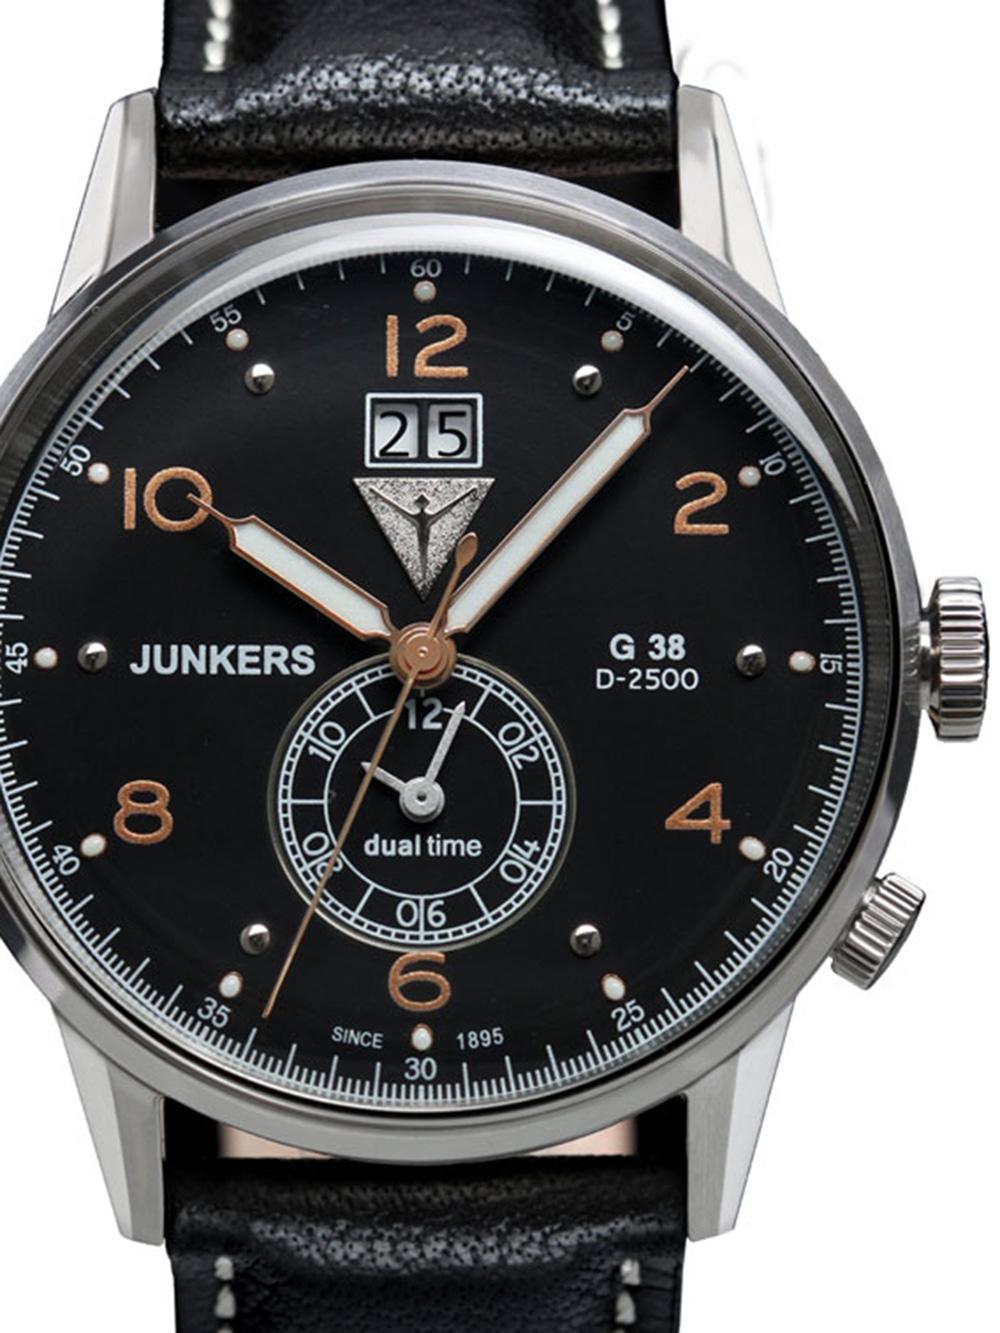 Junkers 6940 5 G38 Dual Time Herrenuhr silber, schwarz 10 ATM 42 mm